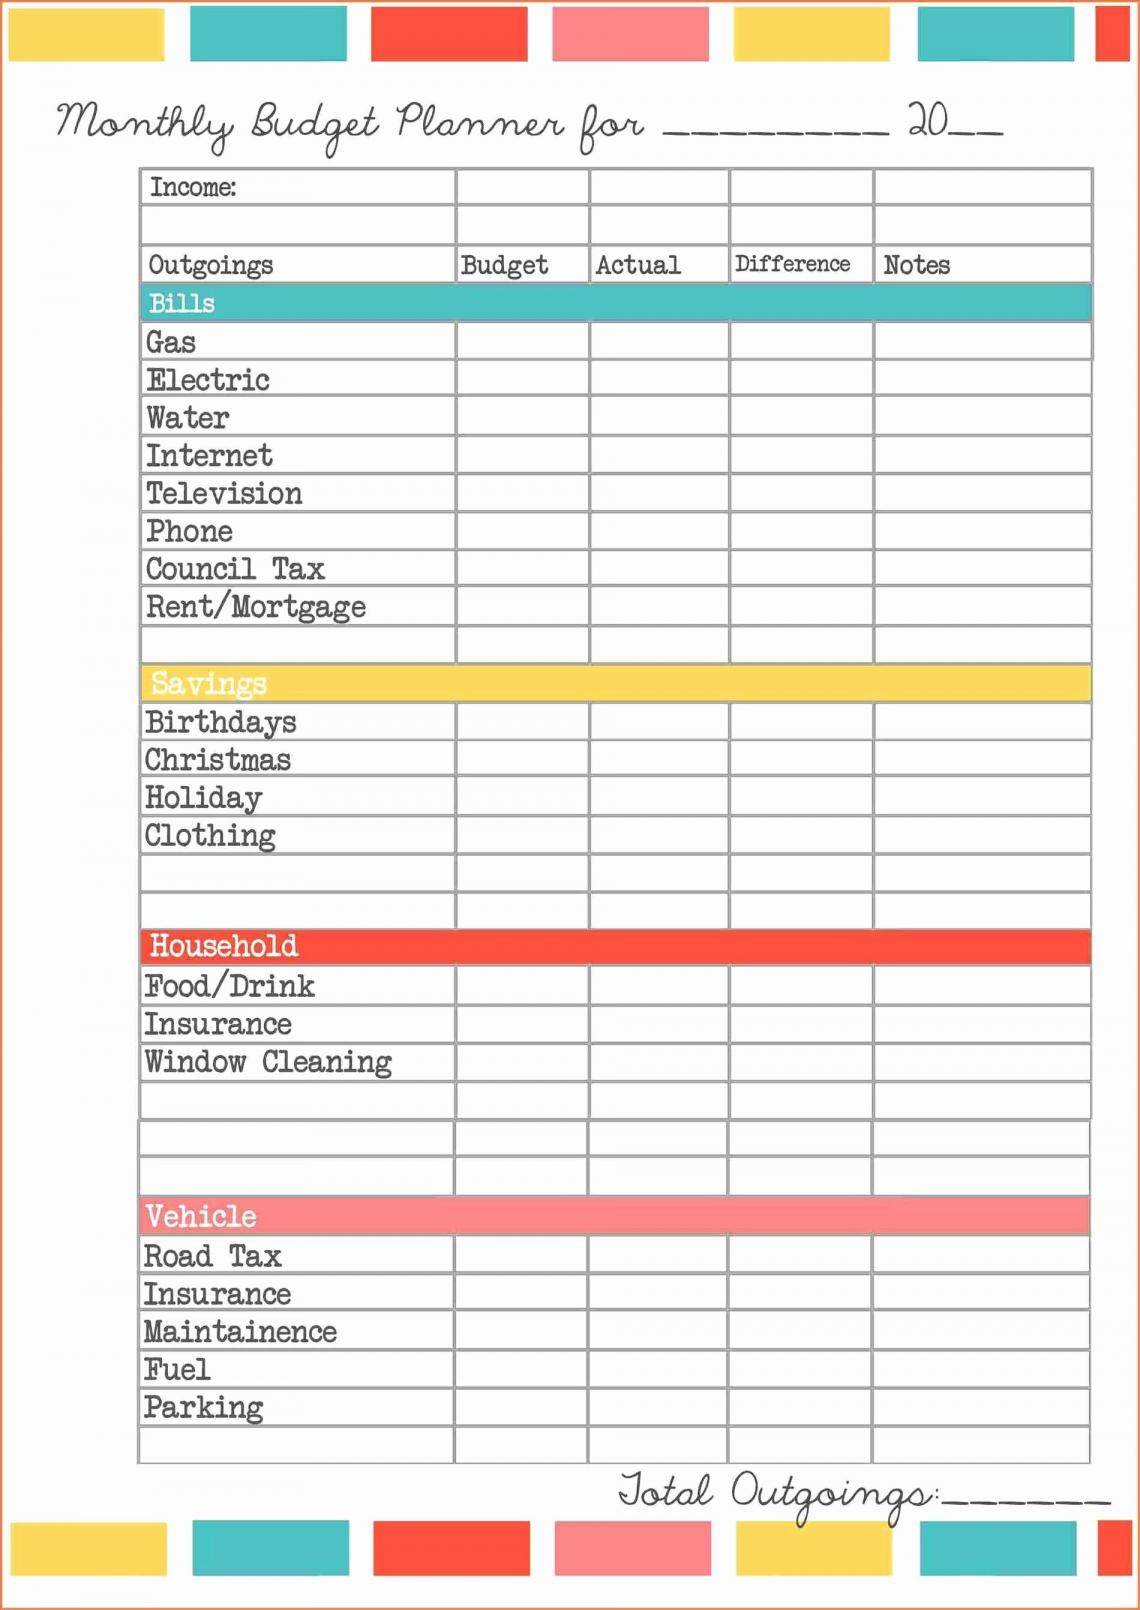 Simple Bookkeeping Spreadsheet Template Free Regarding Basic Bookkeeping Spreadsheet Template Simple Esales Sample